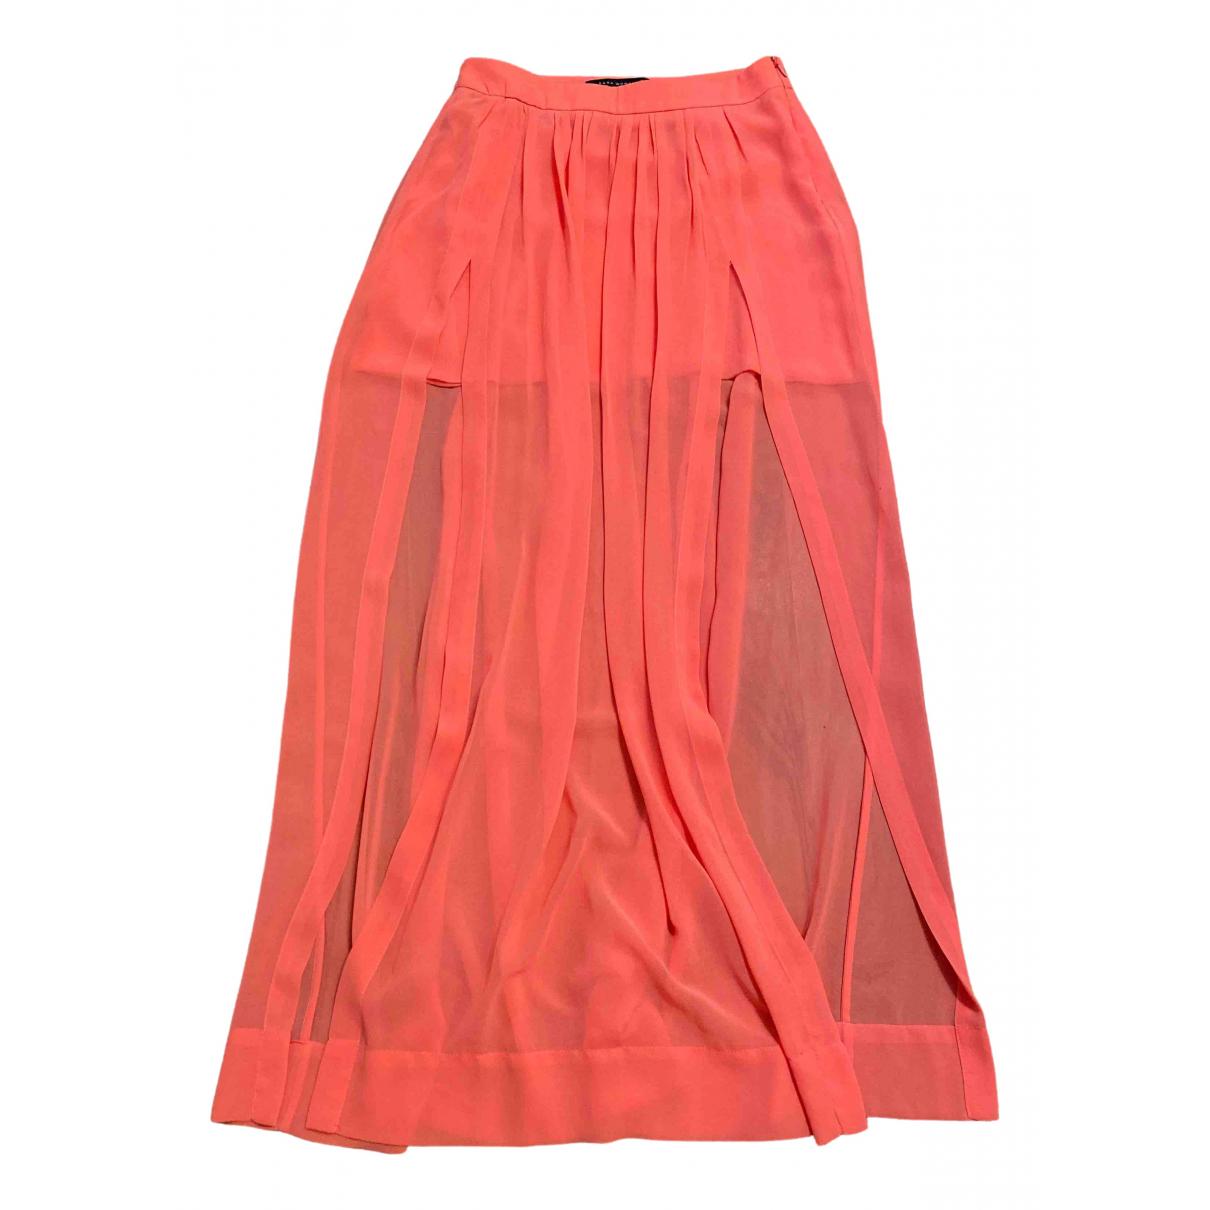 Zara - Jupe   pour femme - orange